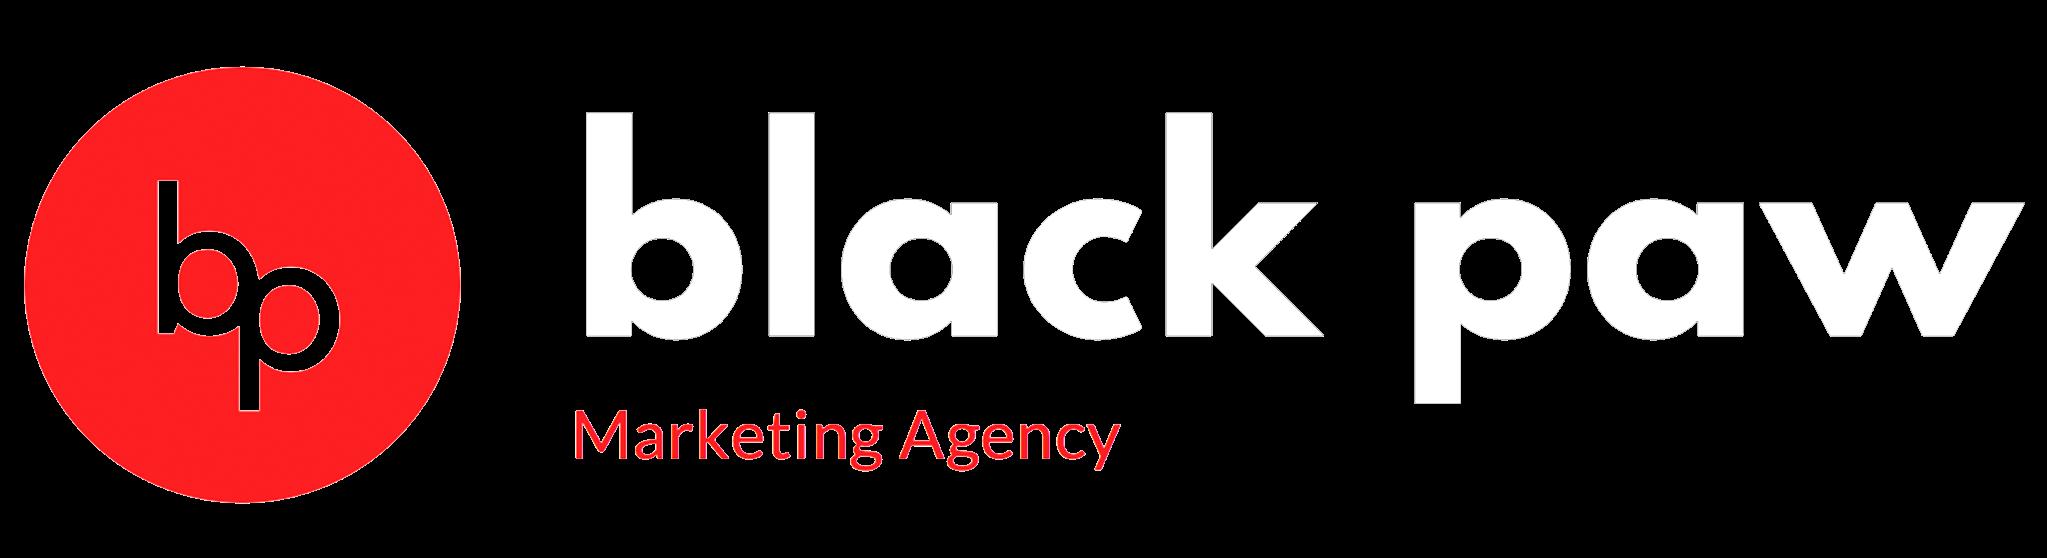 Black Paw Marketing